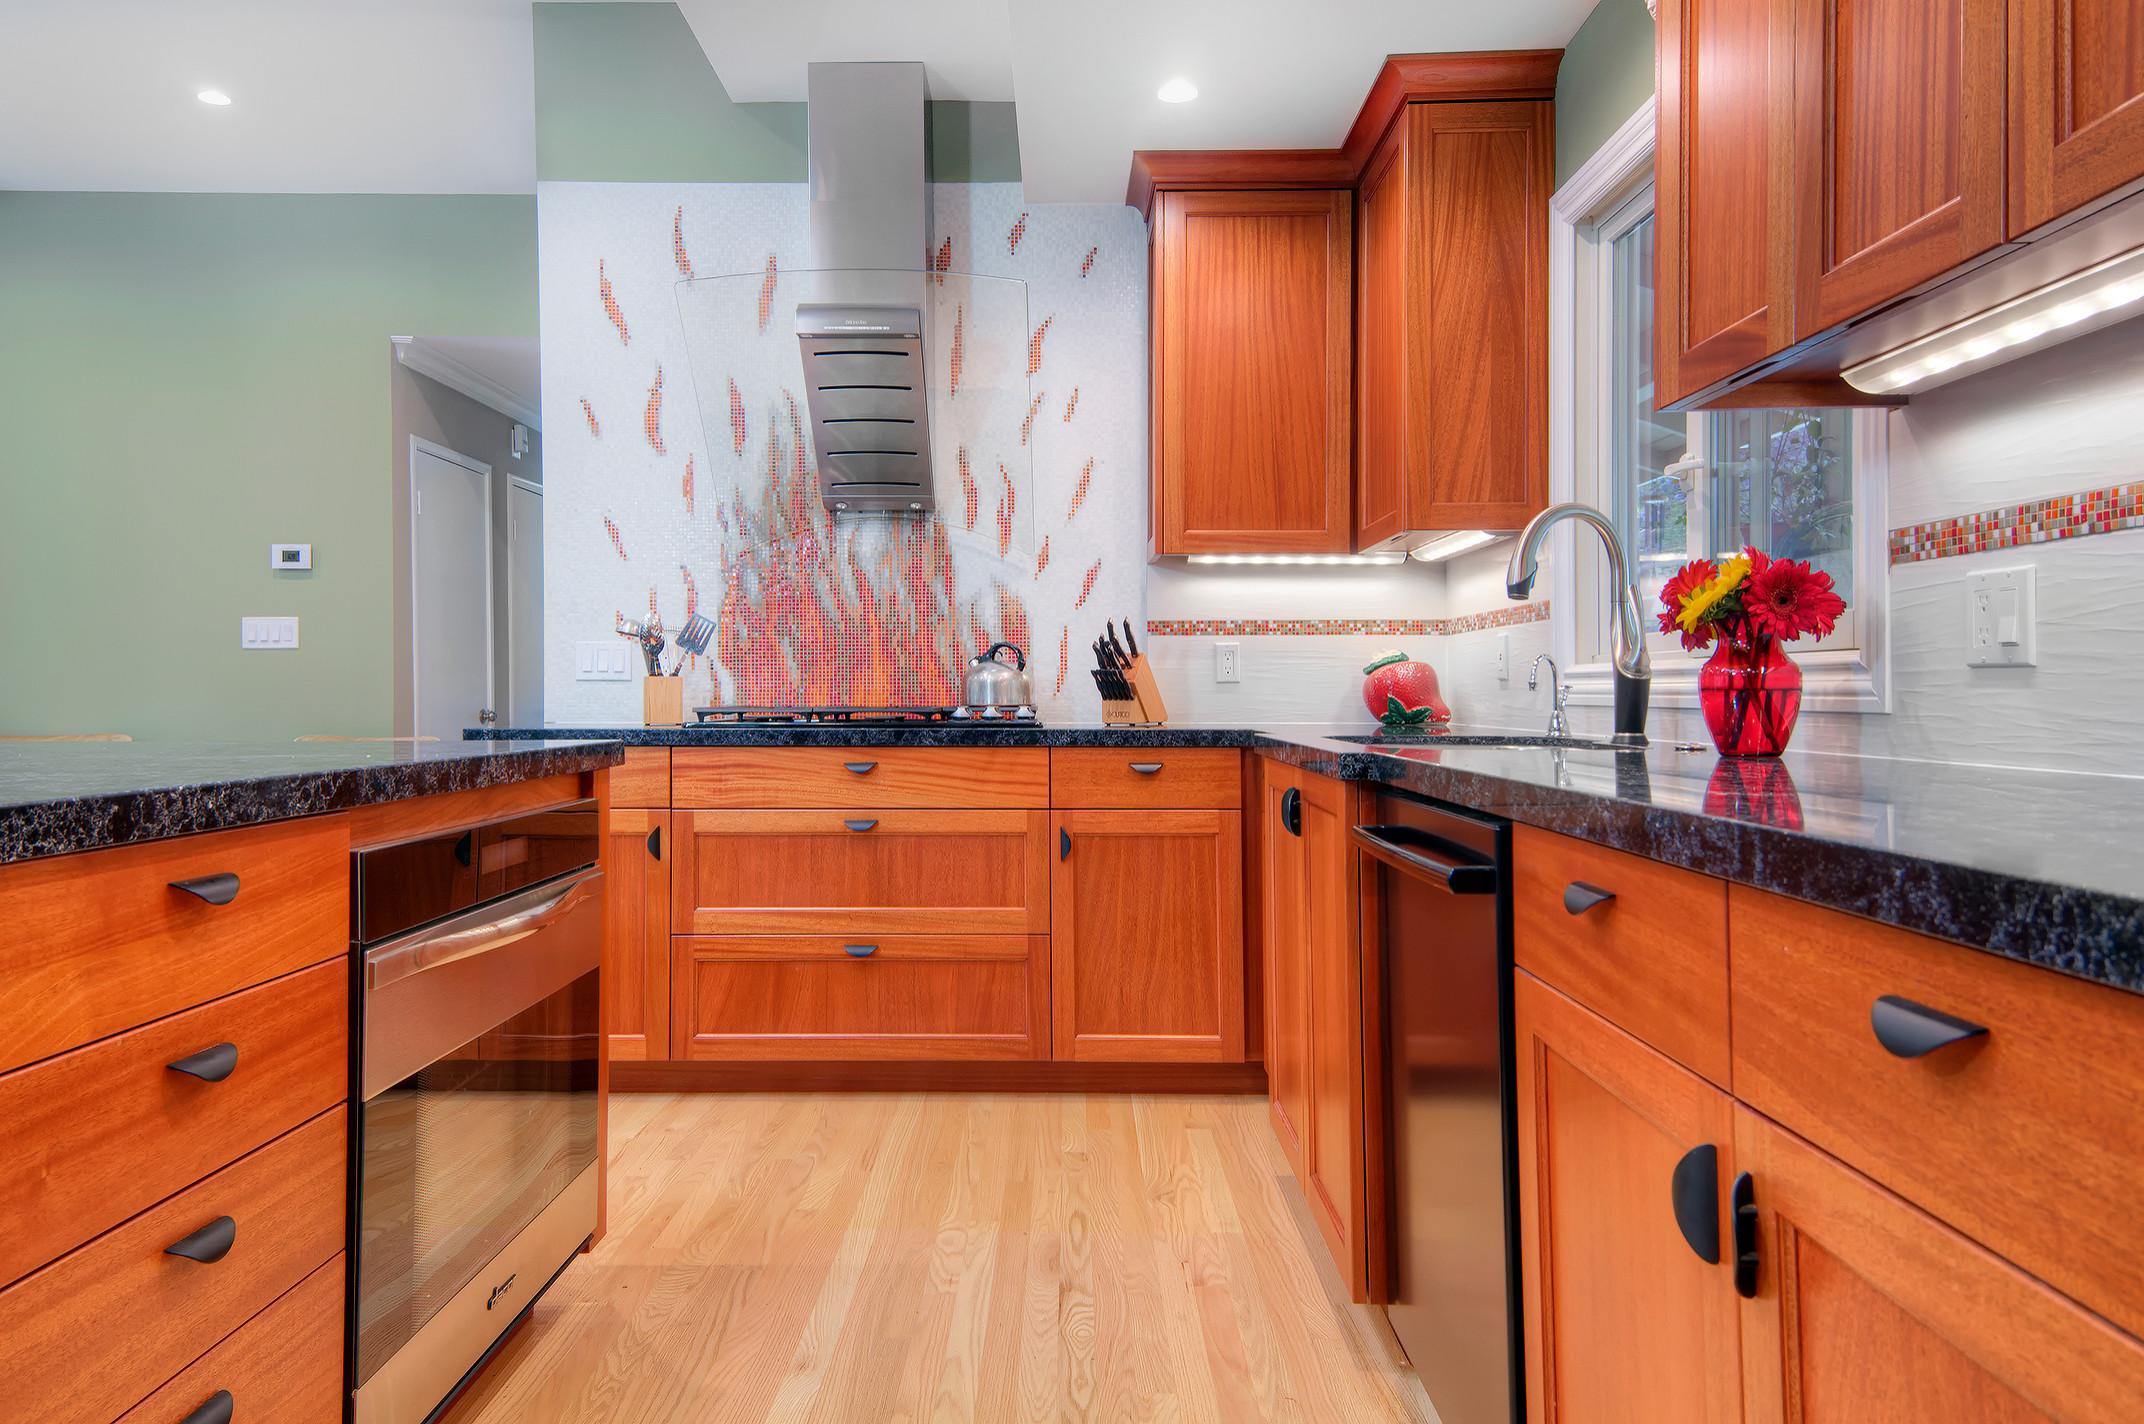 Astrascadero Contemporary Kitchen and Bath